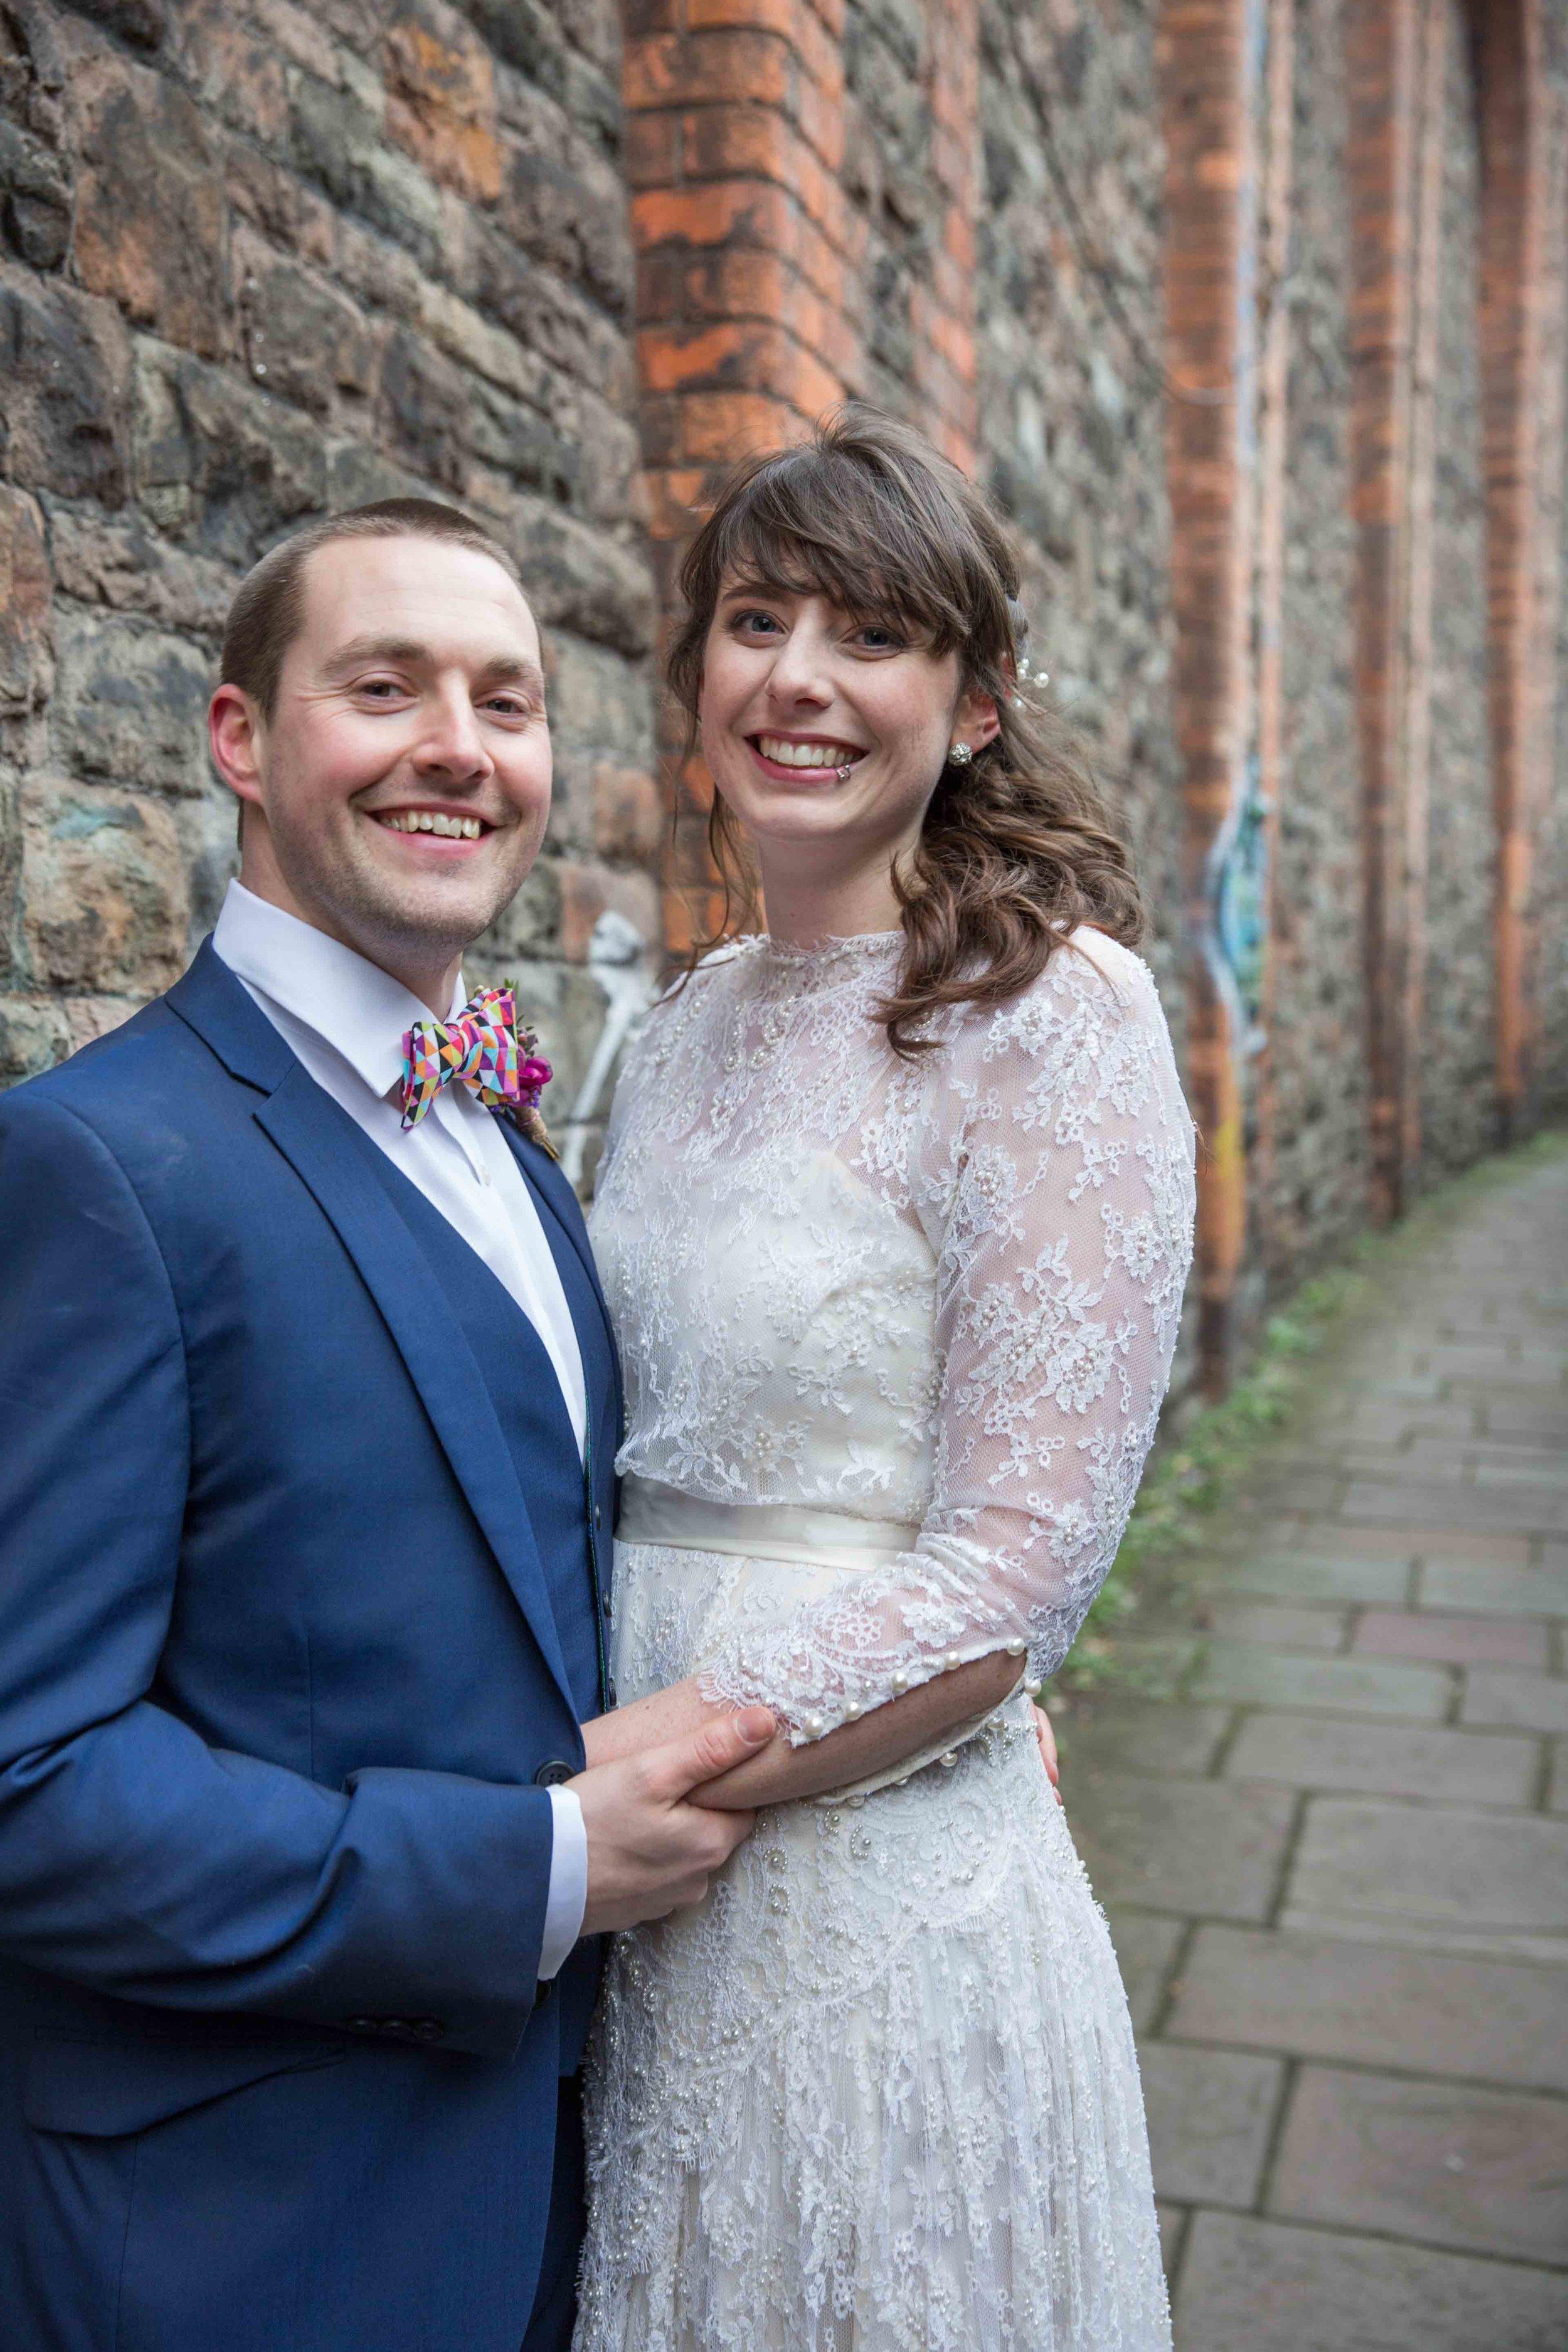 Adam & Faye - Wright Wedding Photography - Bristol Wedding Photographer -291.jpg